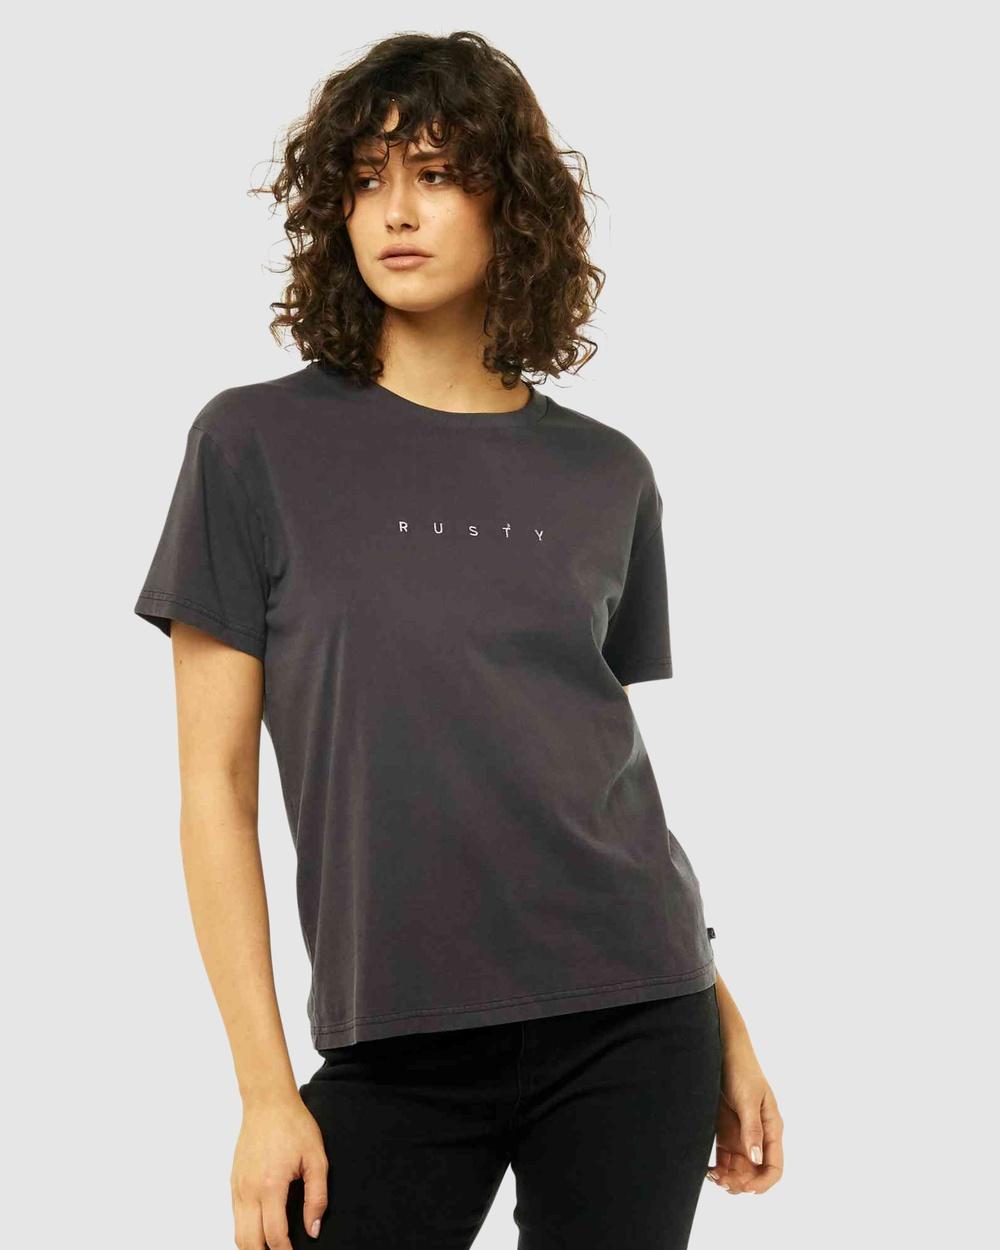 Rusty Essentials Ember Short Sleeve Tee T-Shirts BLK Australia